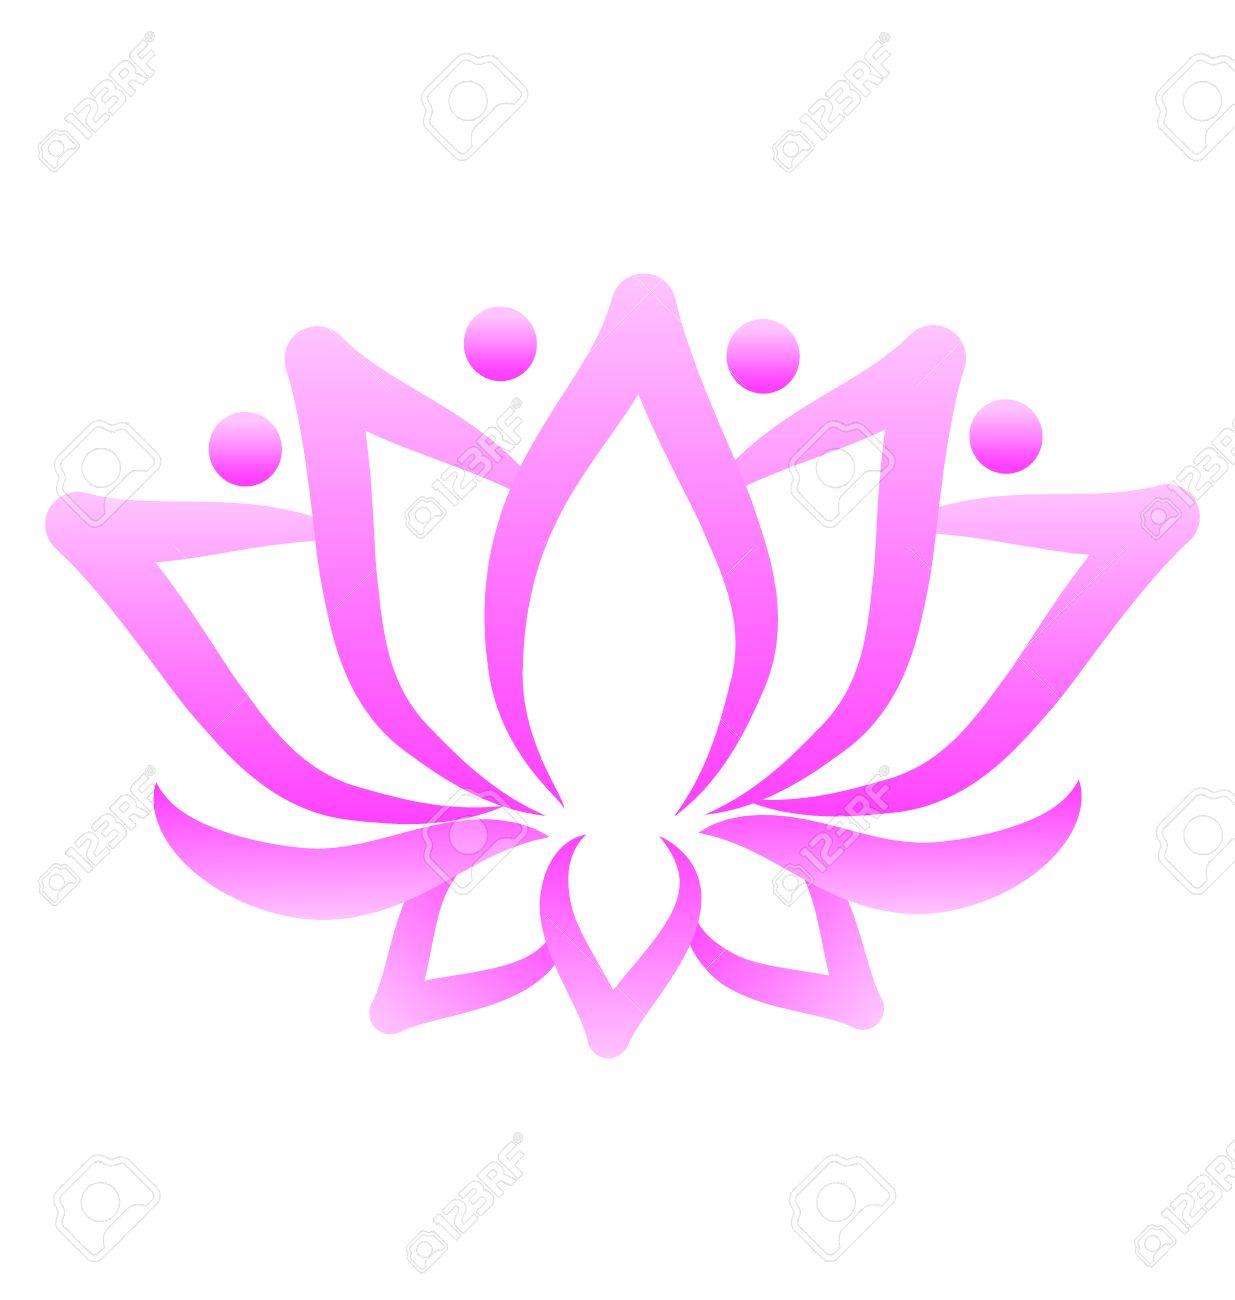 Lotus flower logo vector royalty free cliparts vectors and stock lotus flower logo vector stock vector 49922579 mightylinksfo